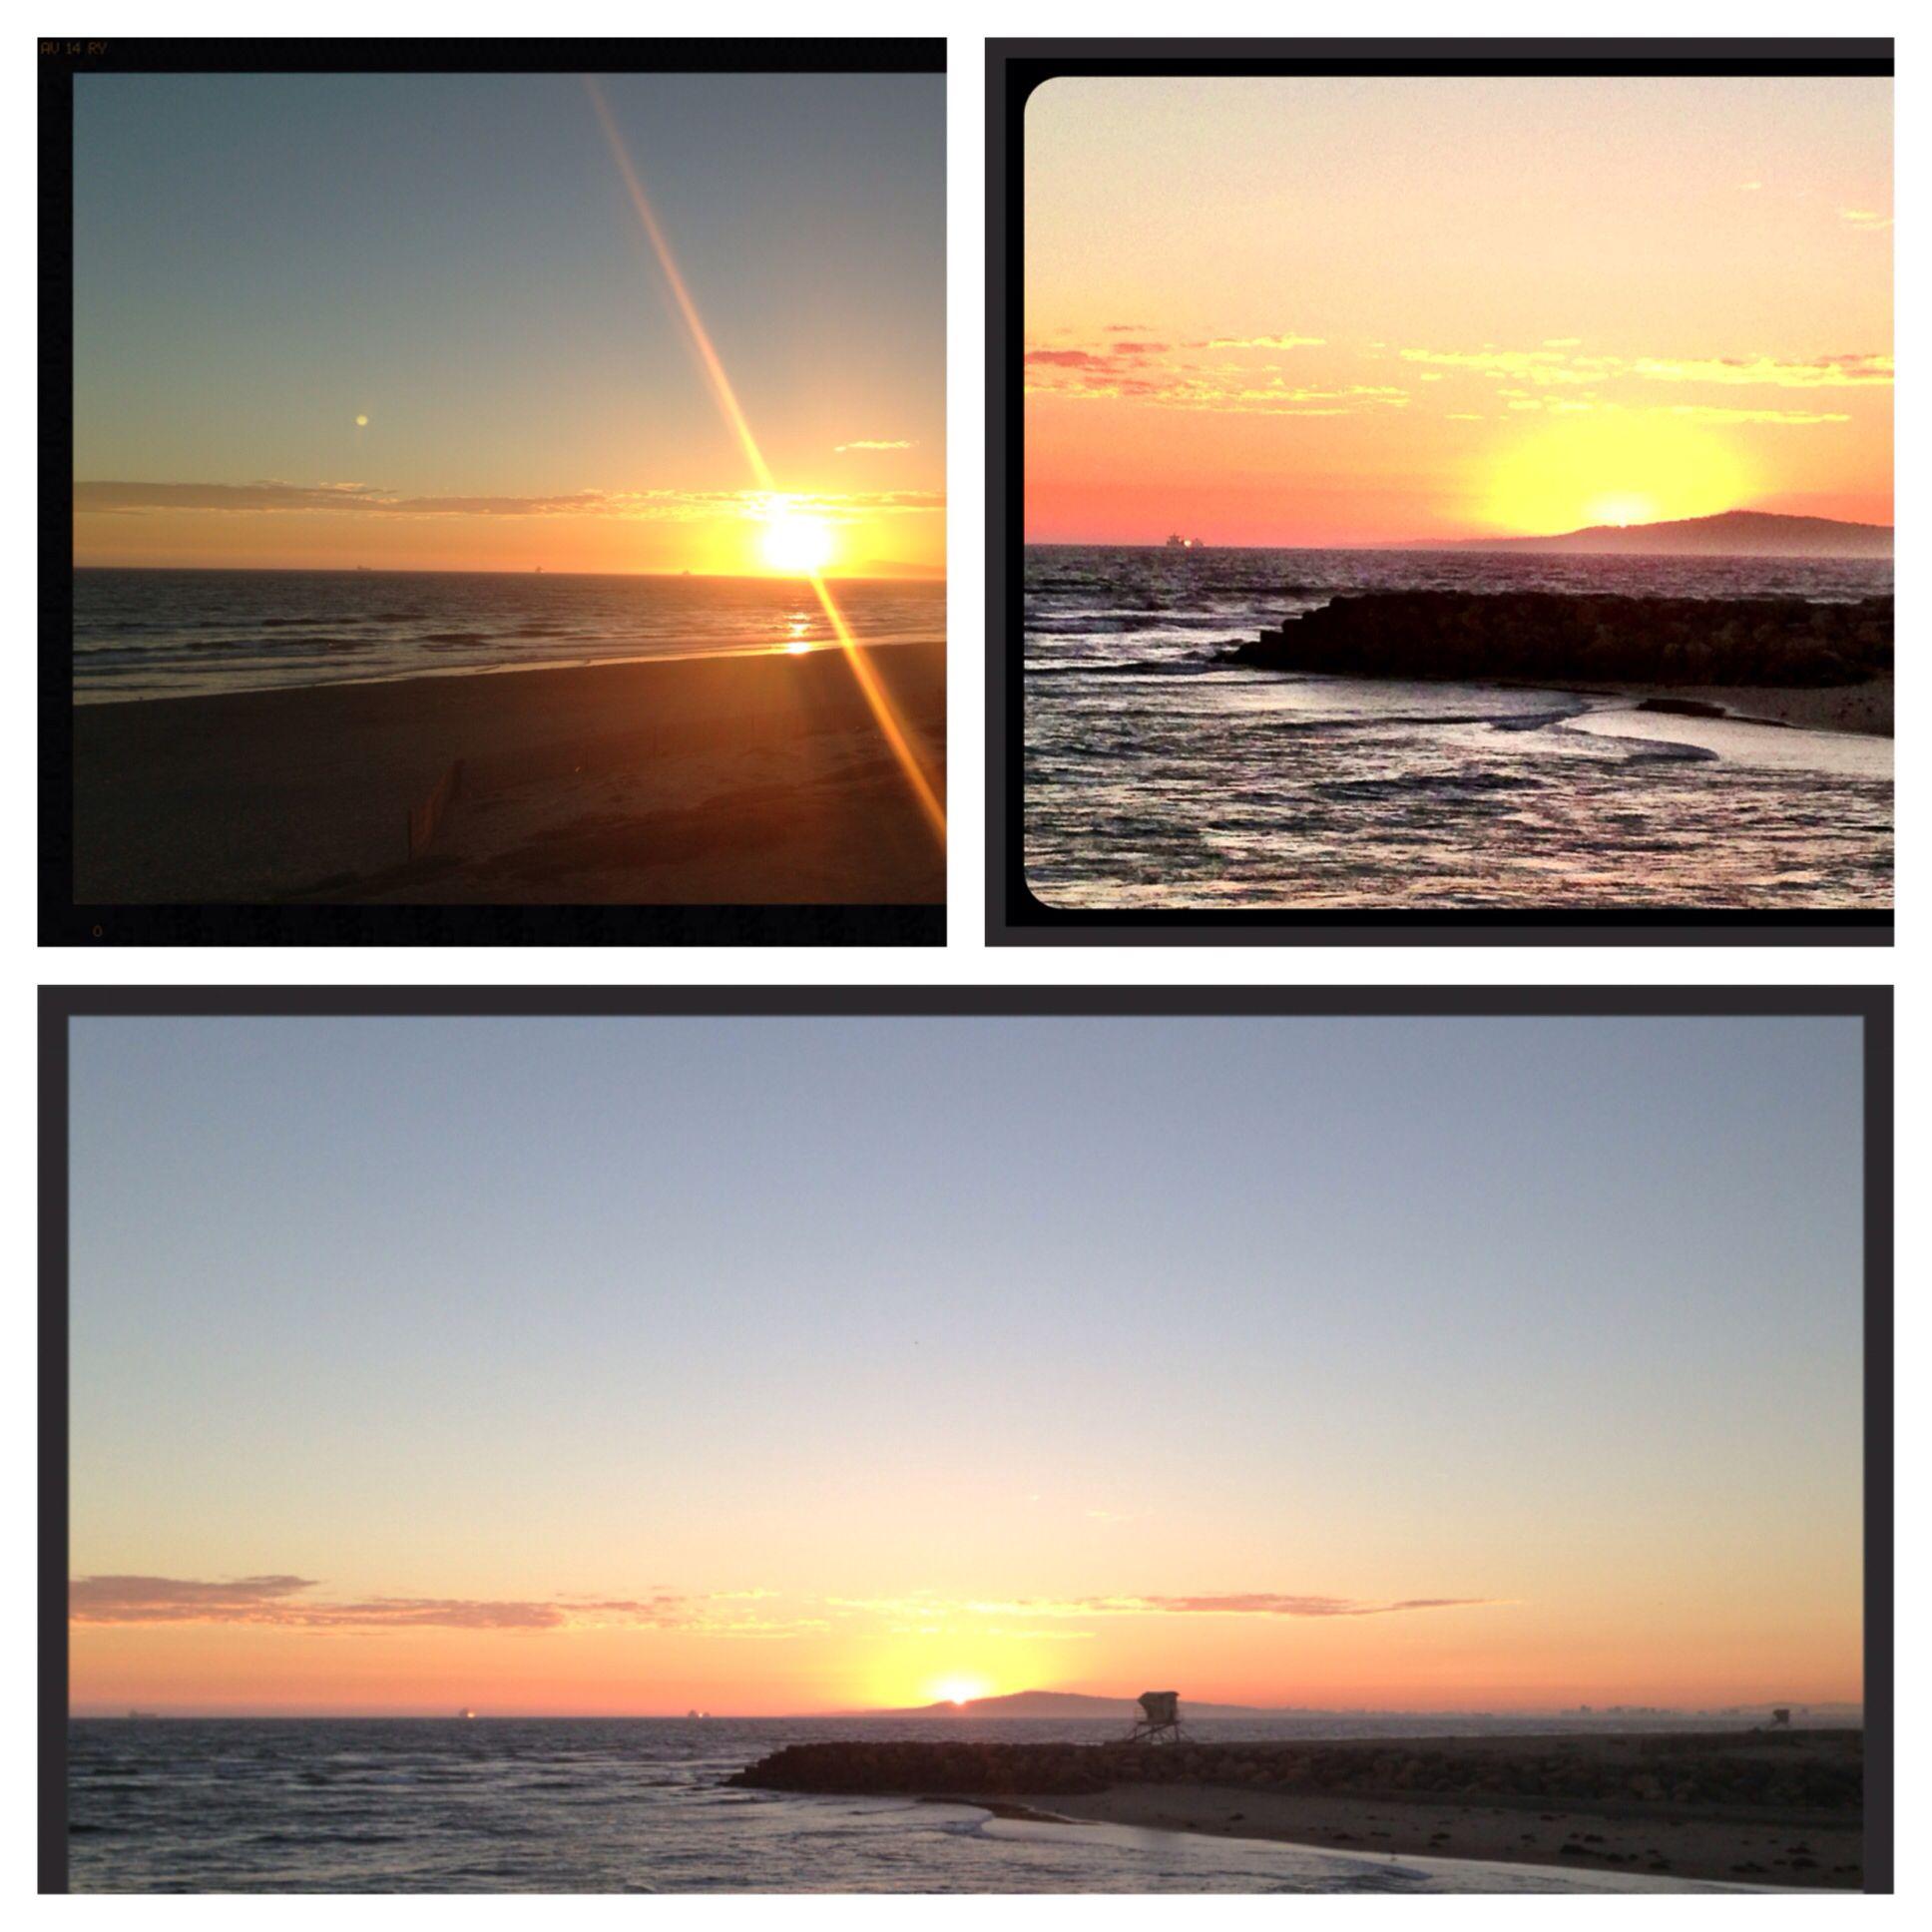 Huntington Beach, CA at sunset.